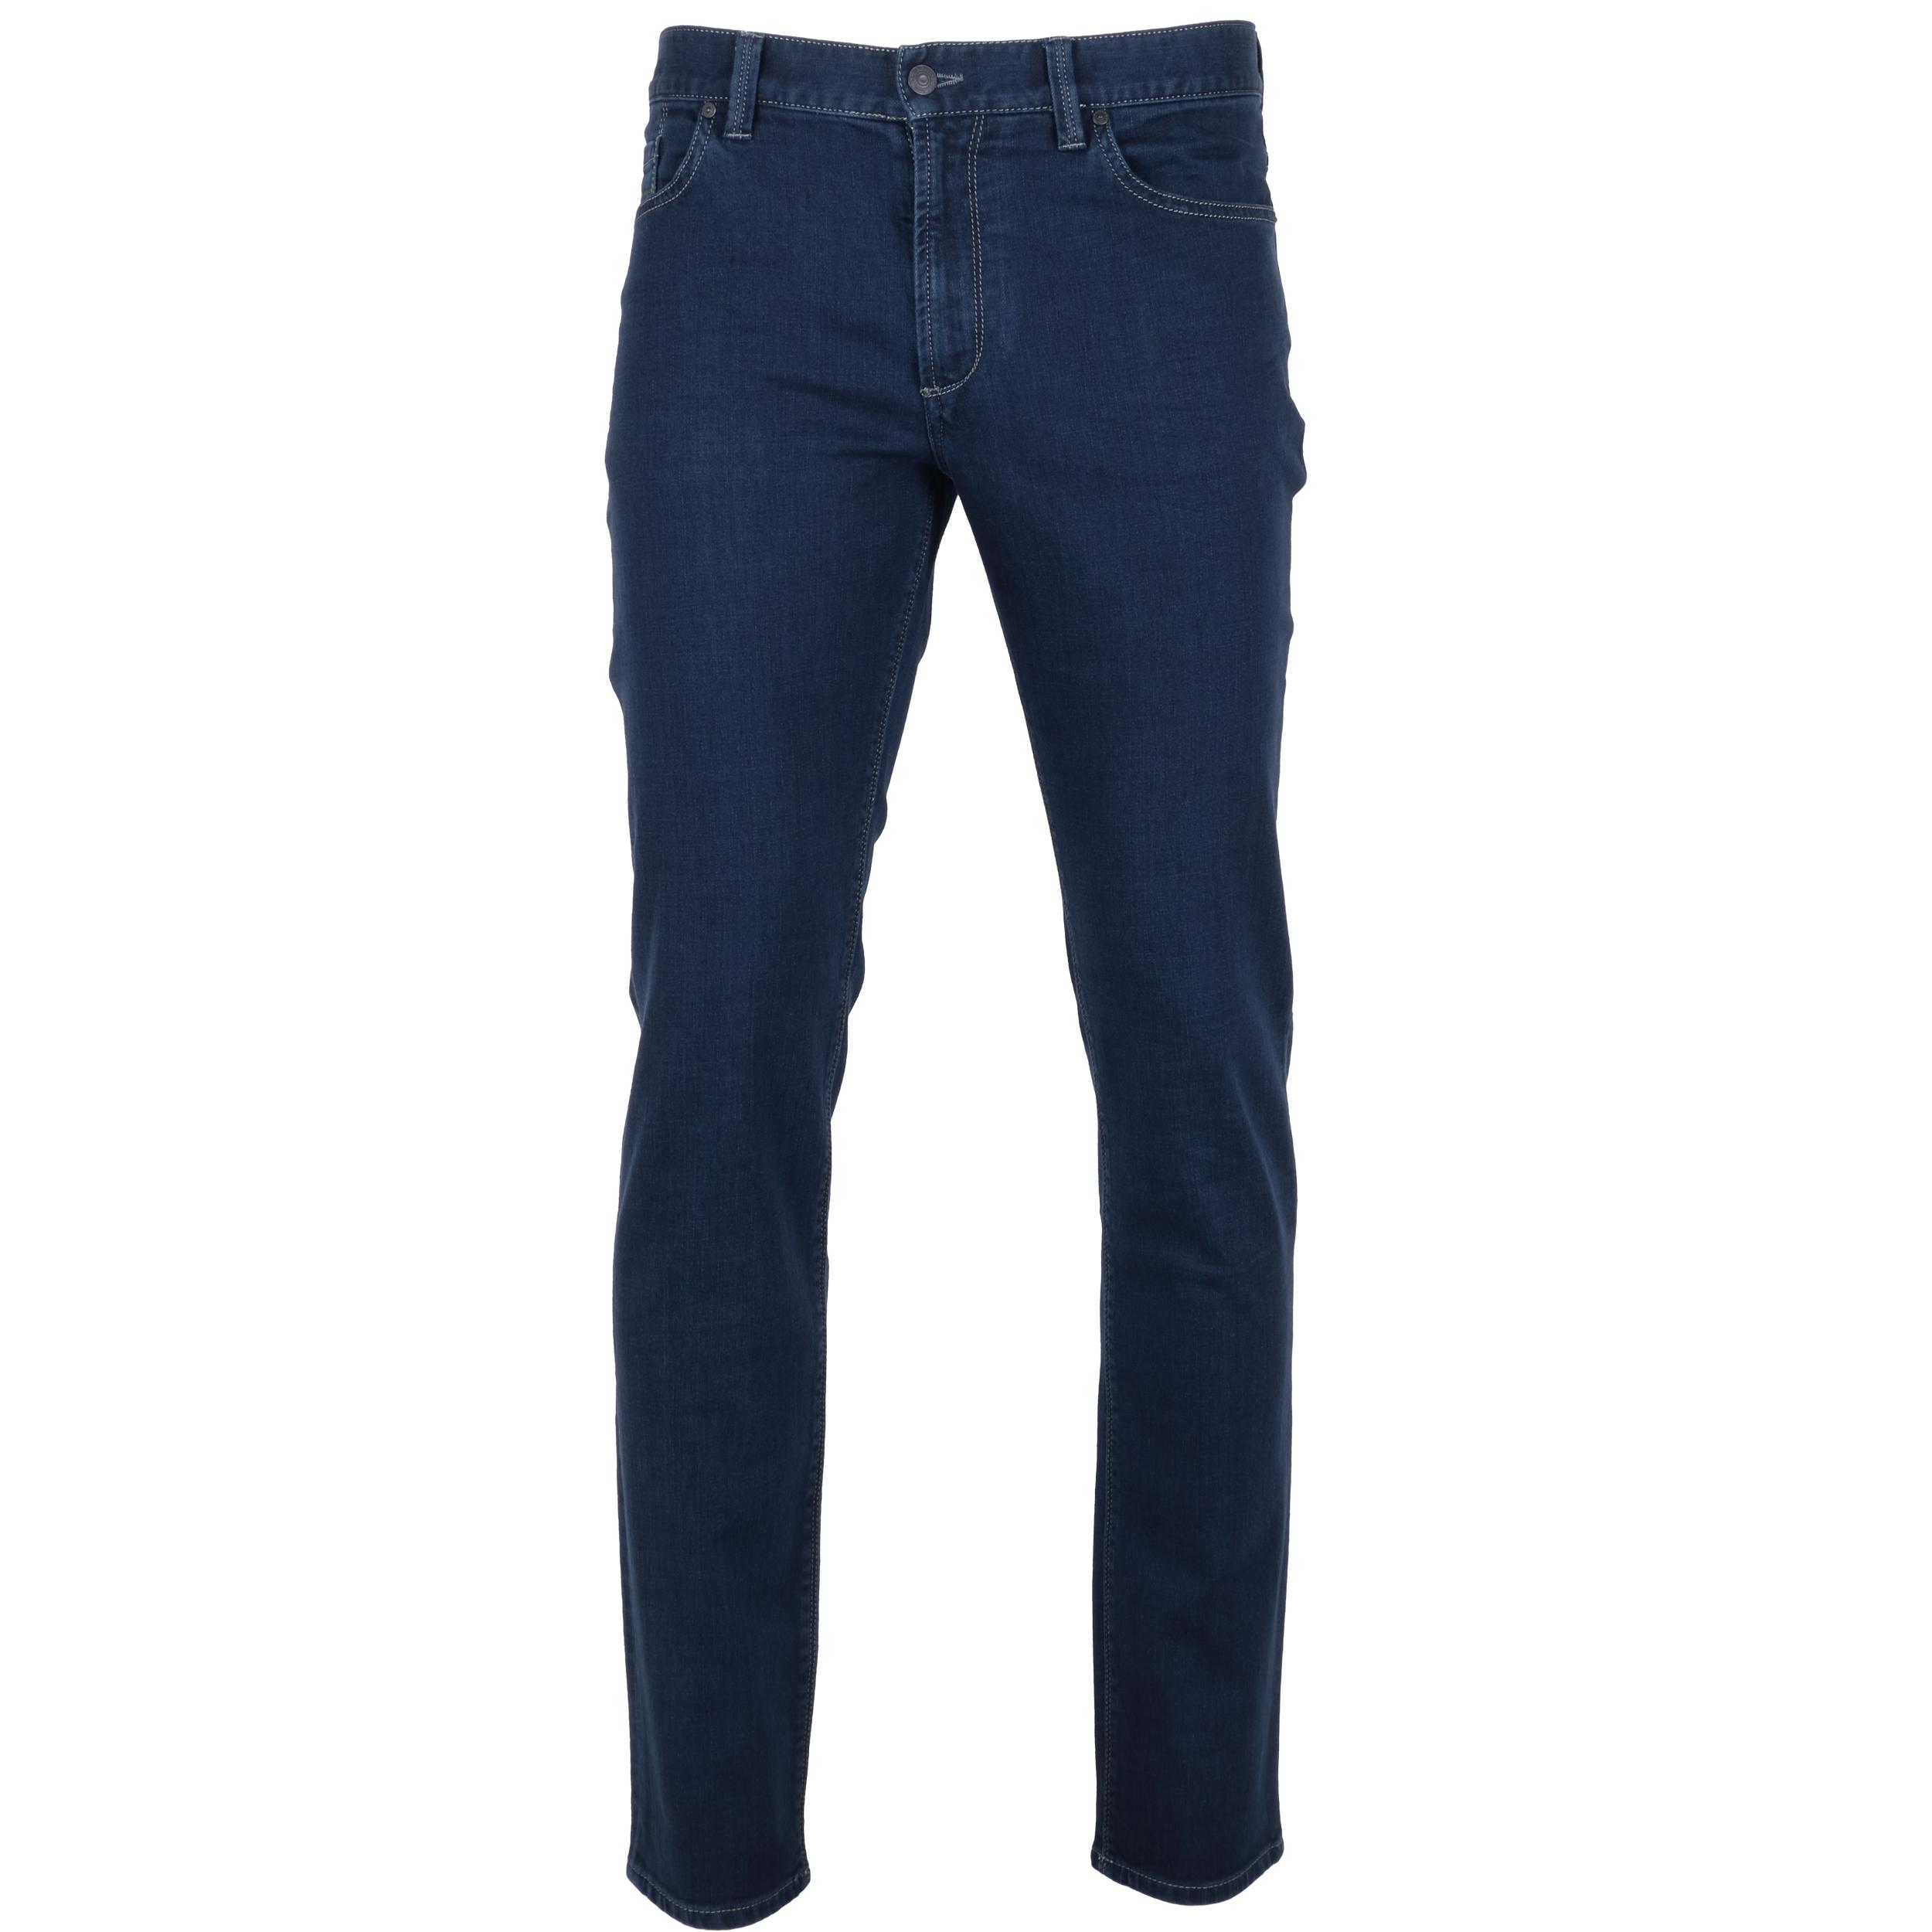 Alberto Herren Jeans Pipe regular fit - blue 32/34